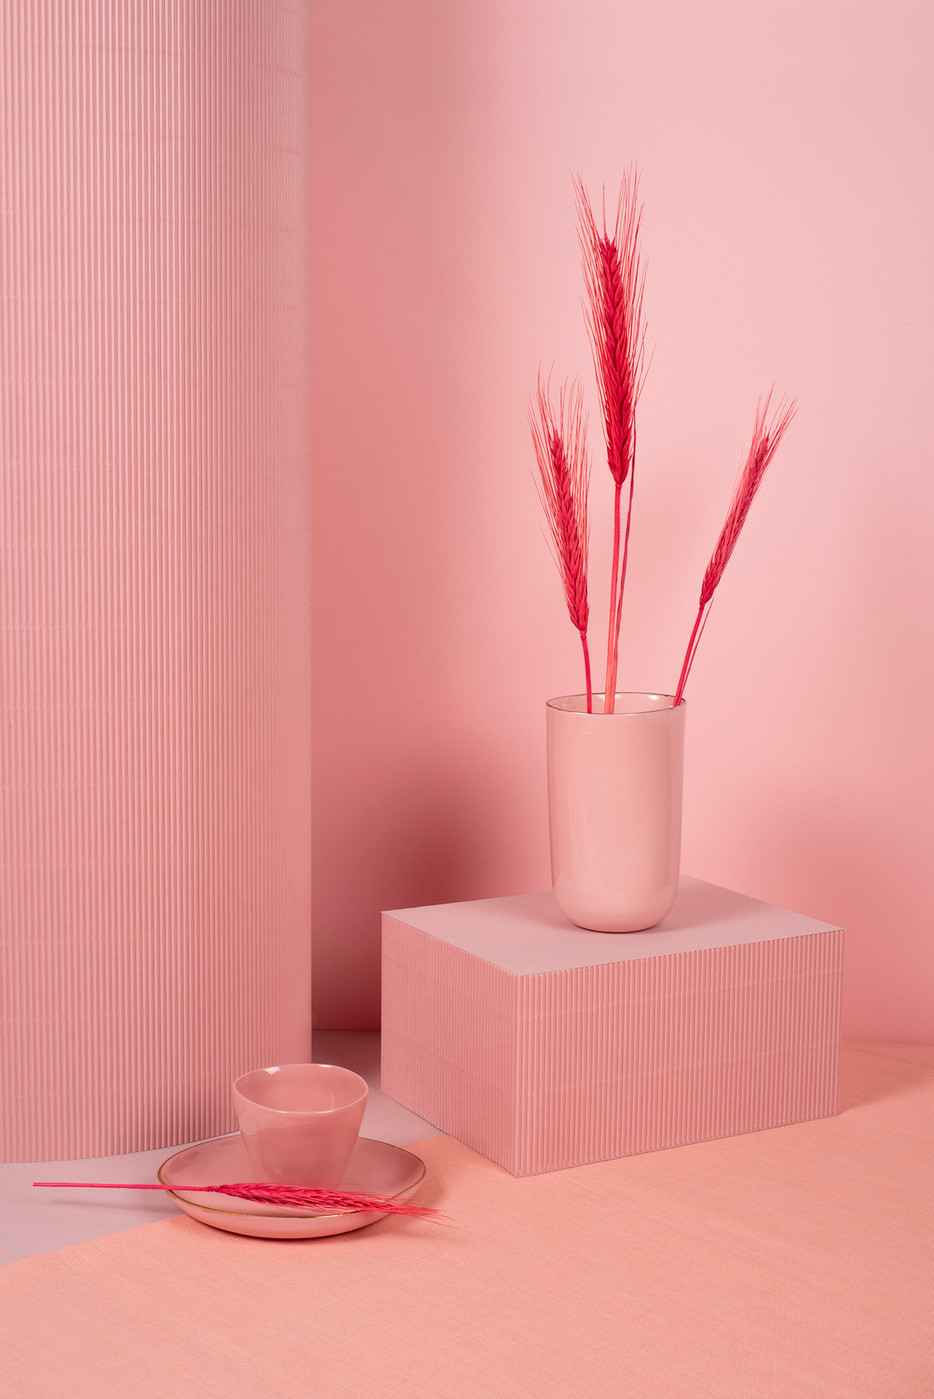 pink-05-small.jpg